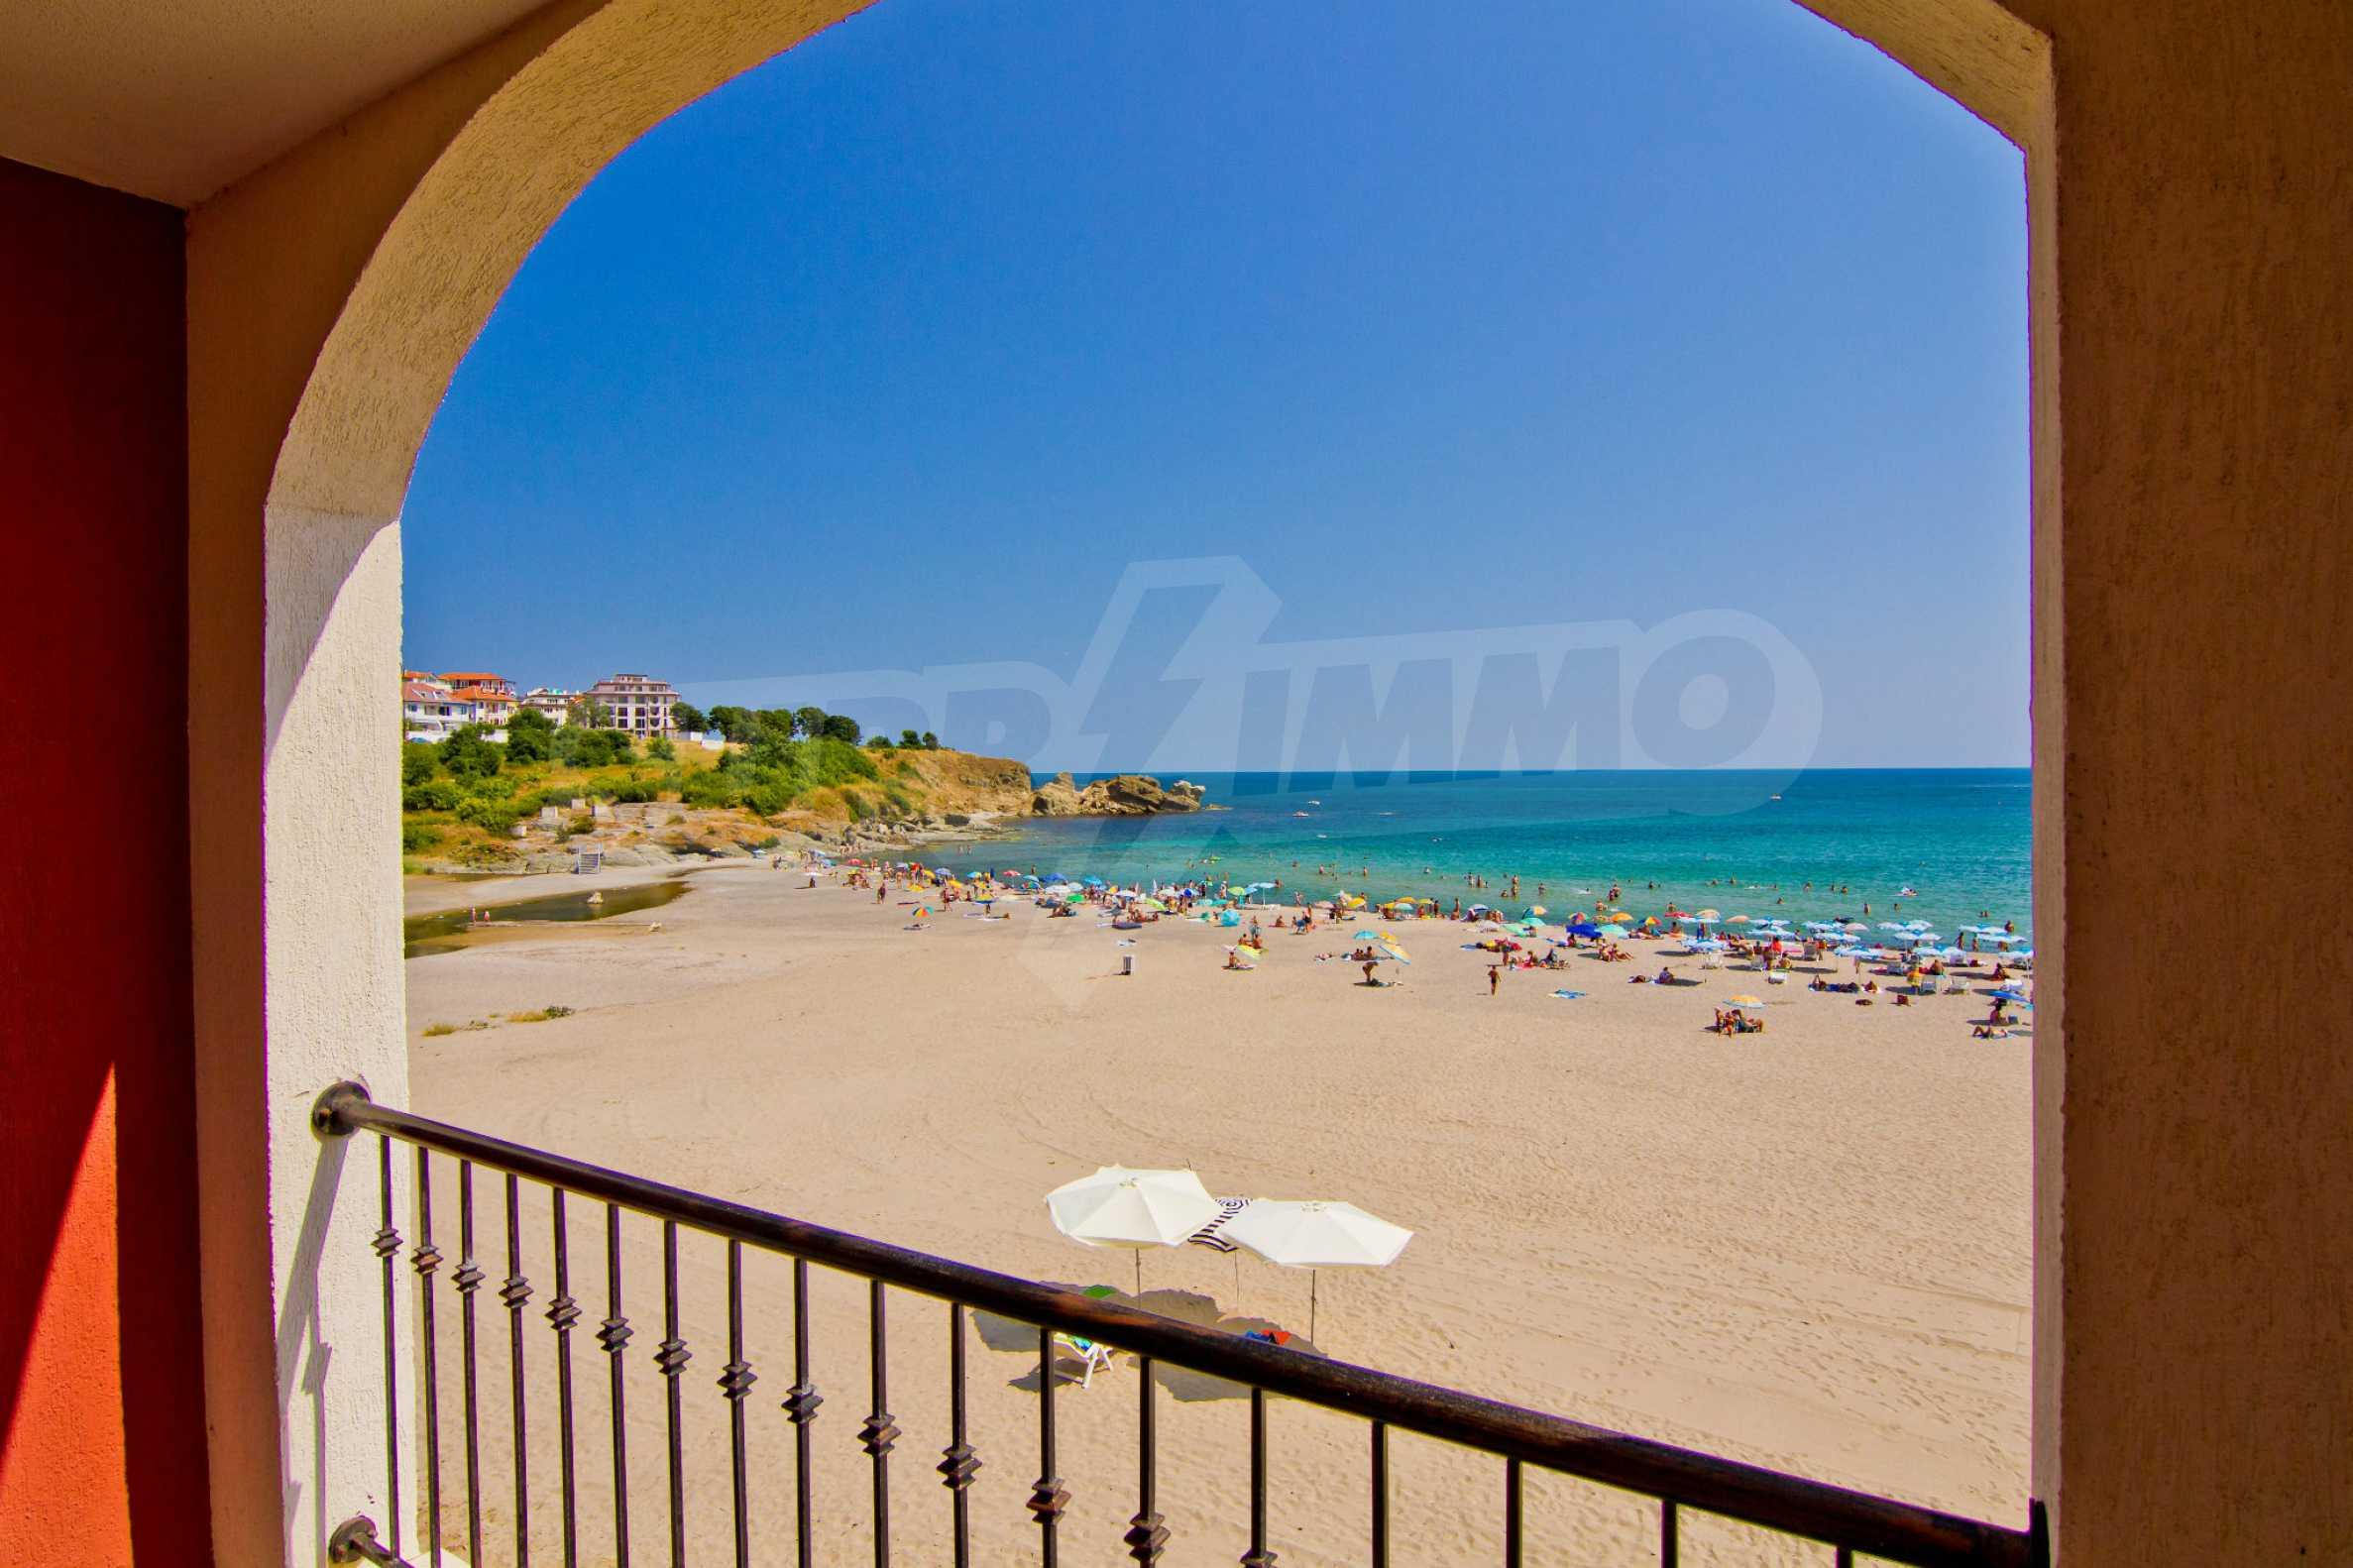 Примеа Бийч Резиденс / Primea Beach Residence 55